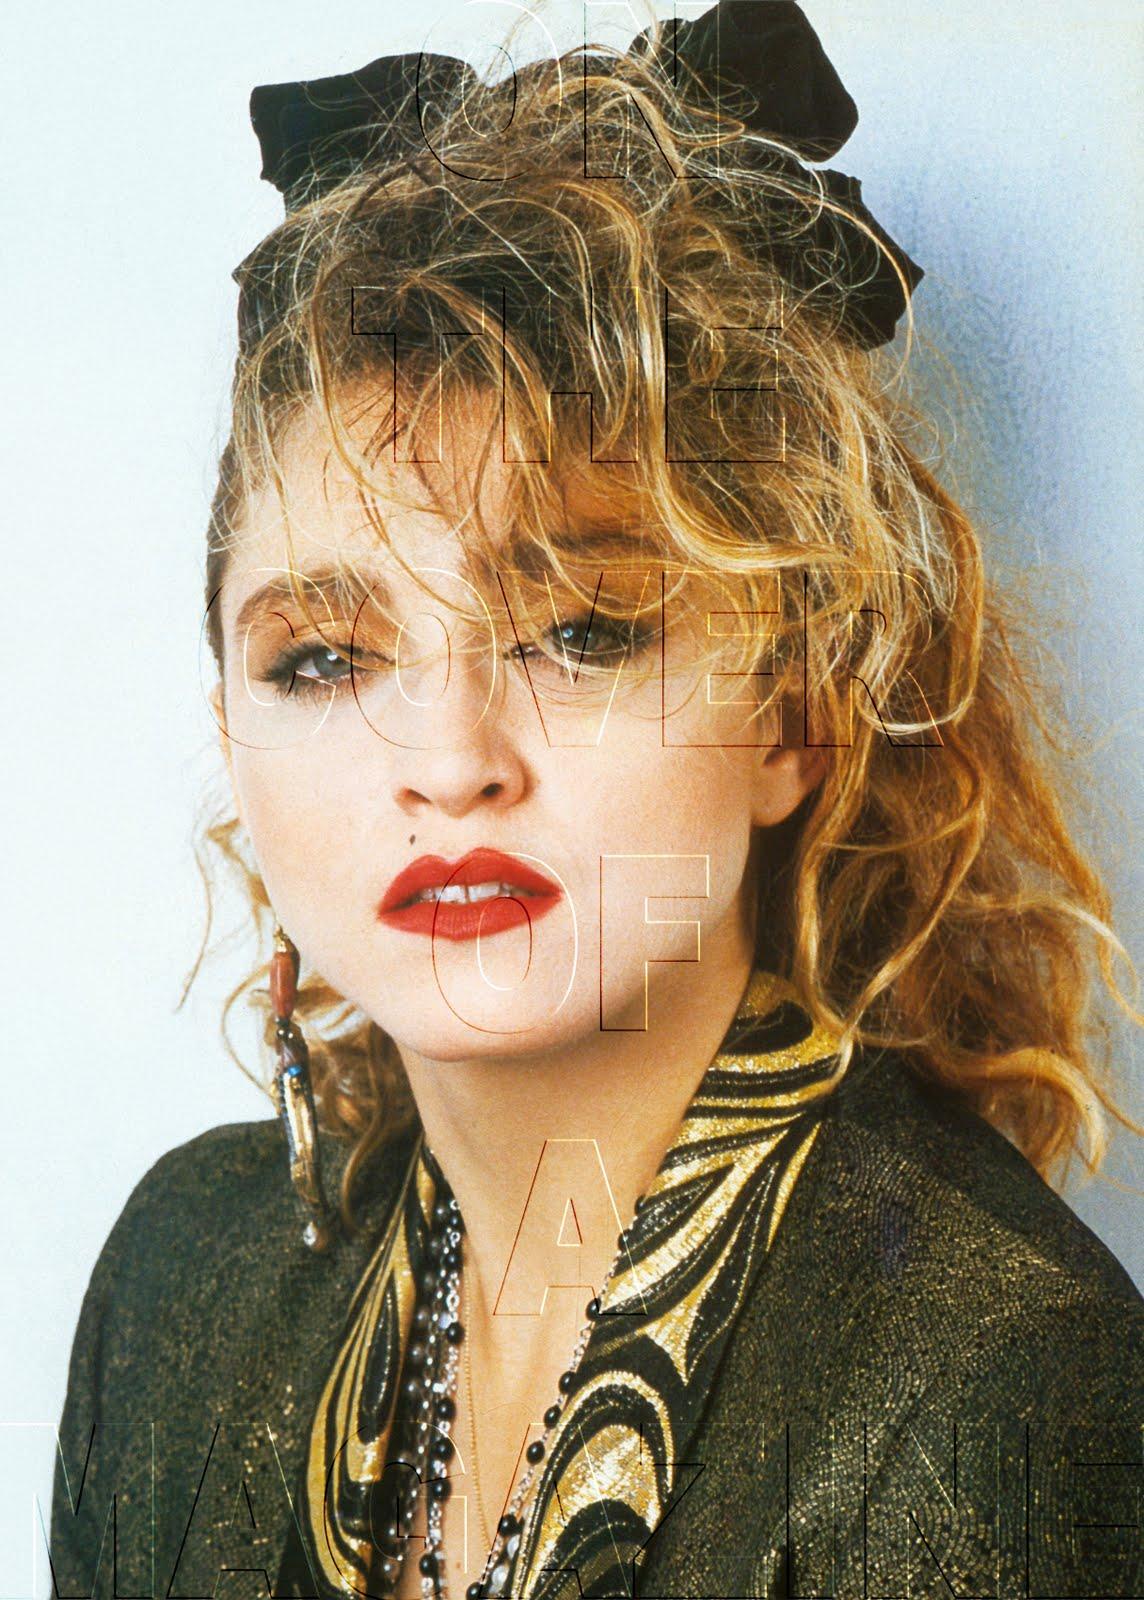 http://2.bp.blogspot.com/_eA7ZafYKvfU/S-3RYql8lTI/AAAAAAAADDE/TcuIbsyu7Bs/s1600/1984+Herb+Ritts+DSS+(Rock+Music+Magazine+Madonna+France+1987+page+13)+copy.jpg